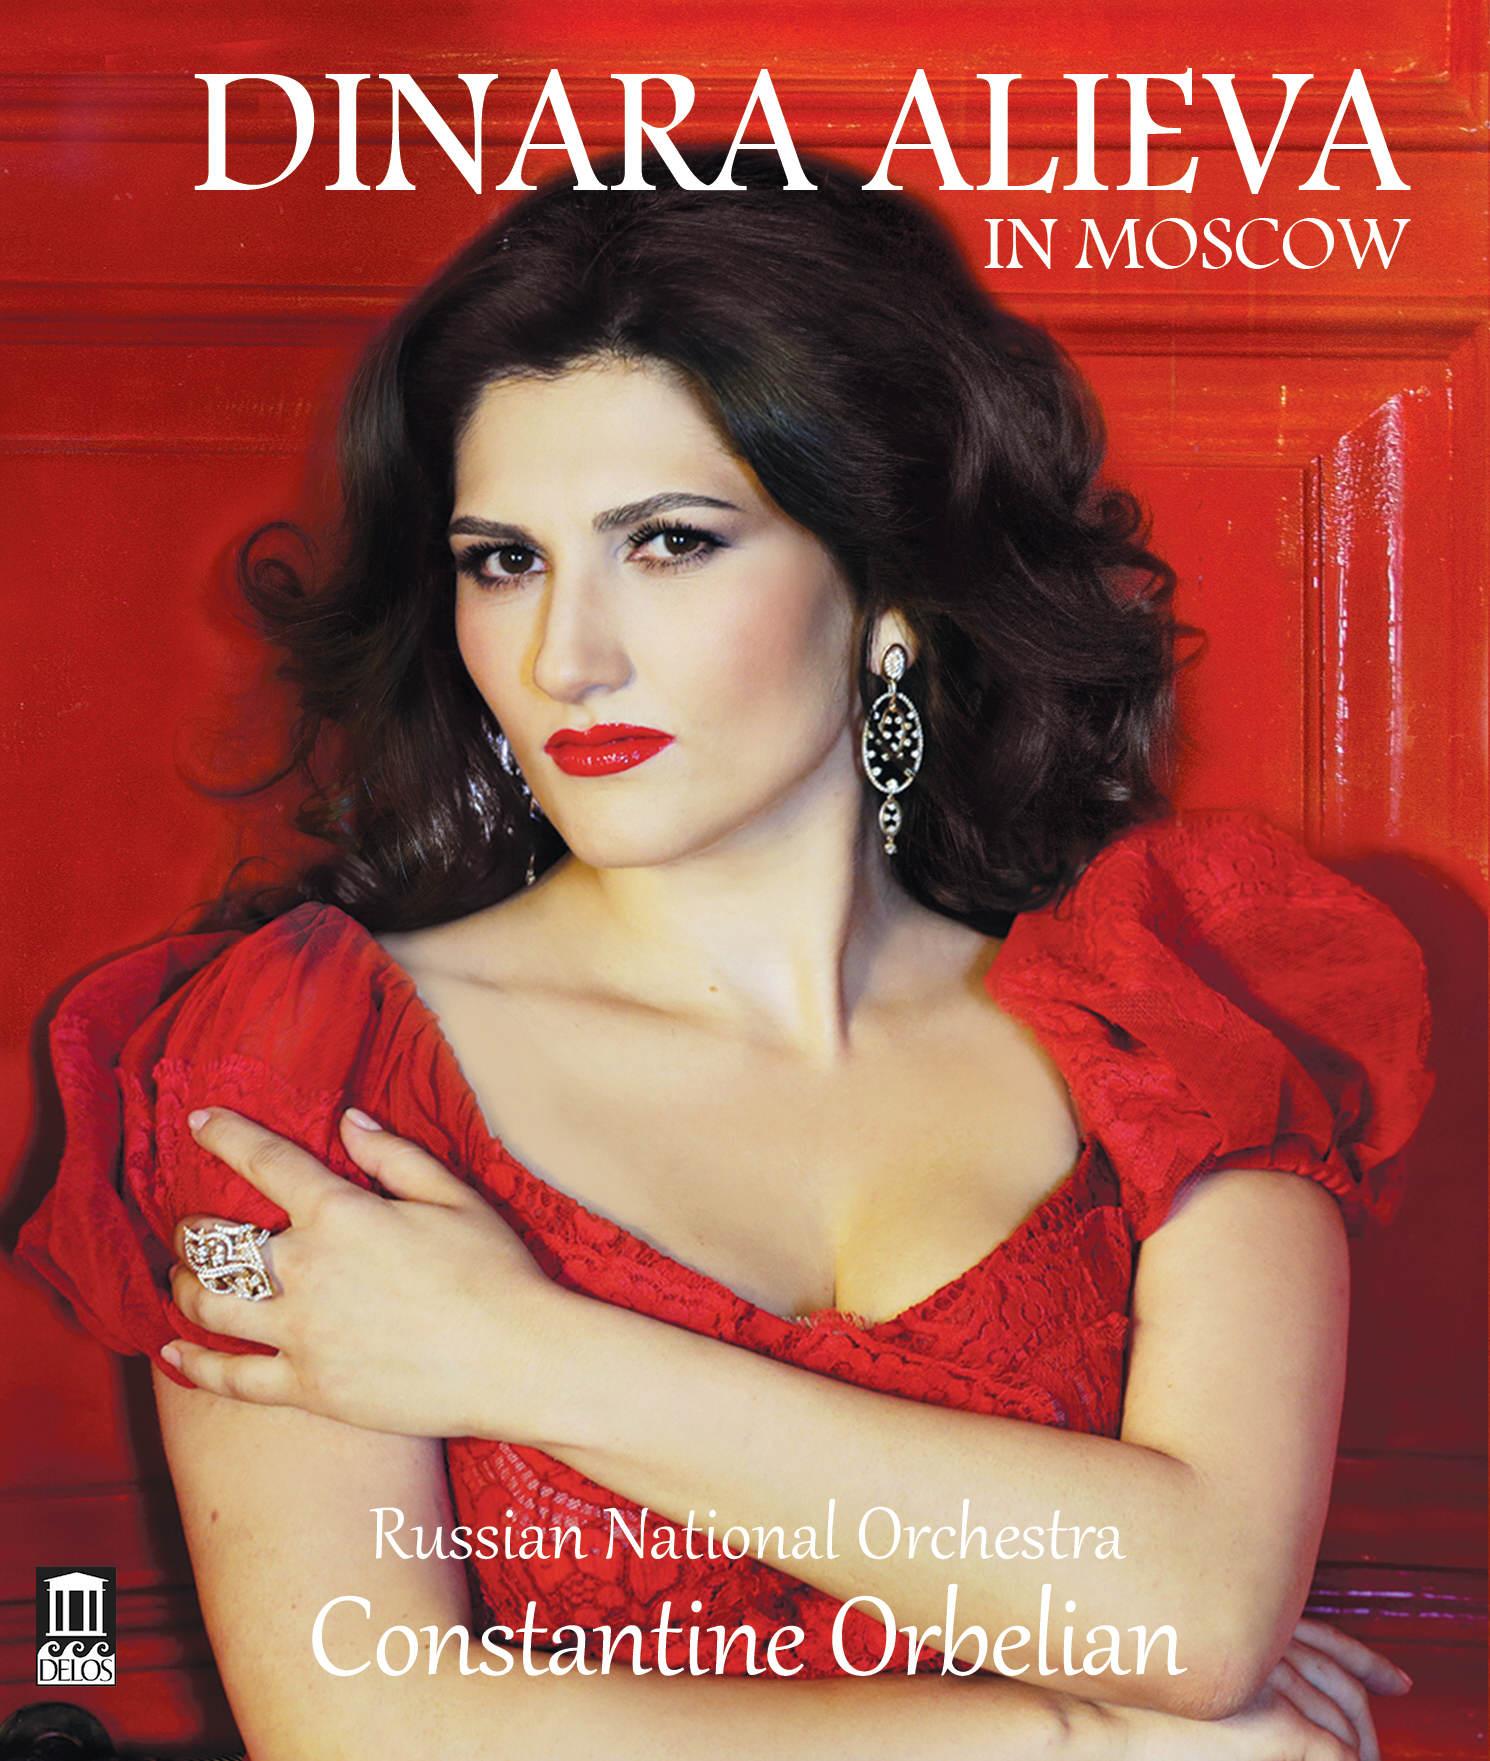 Dinara Alieva in Moscow Blu-Ray